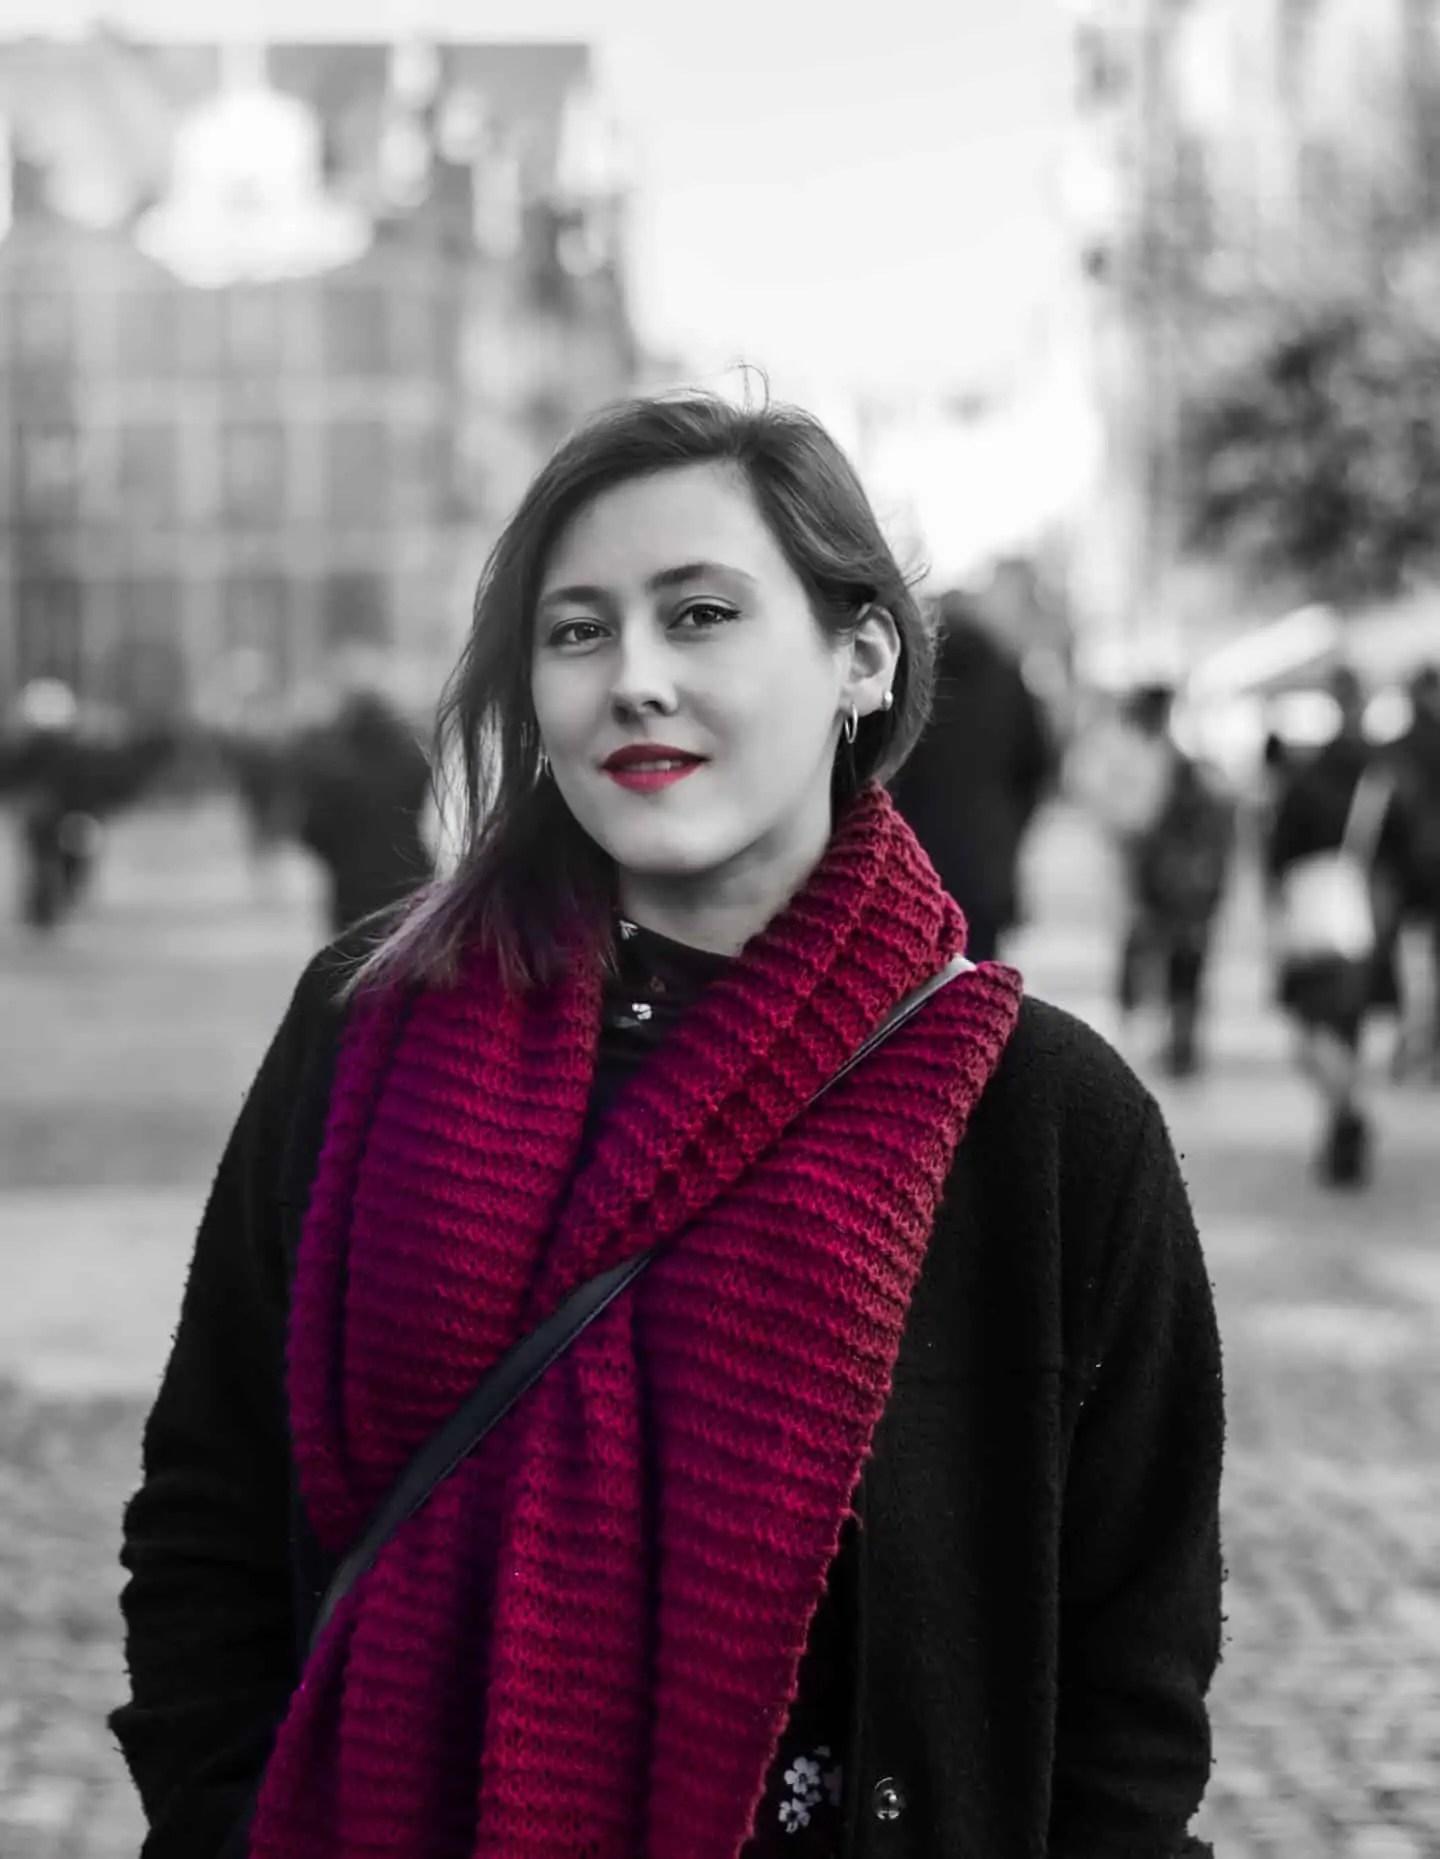 Portret Ela Gdansk BW kolorowy element - Fotografie do druku